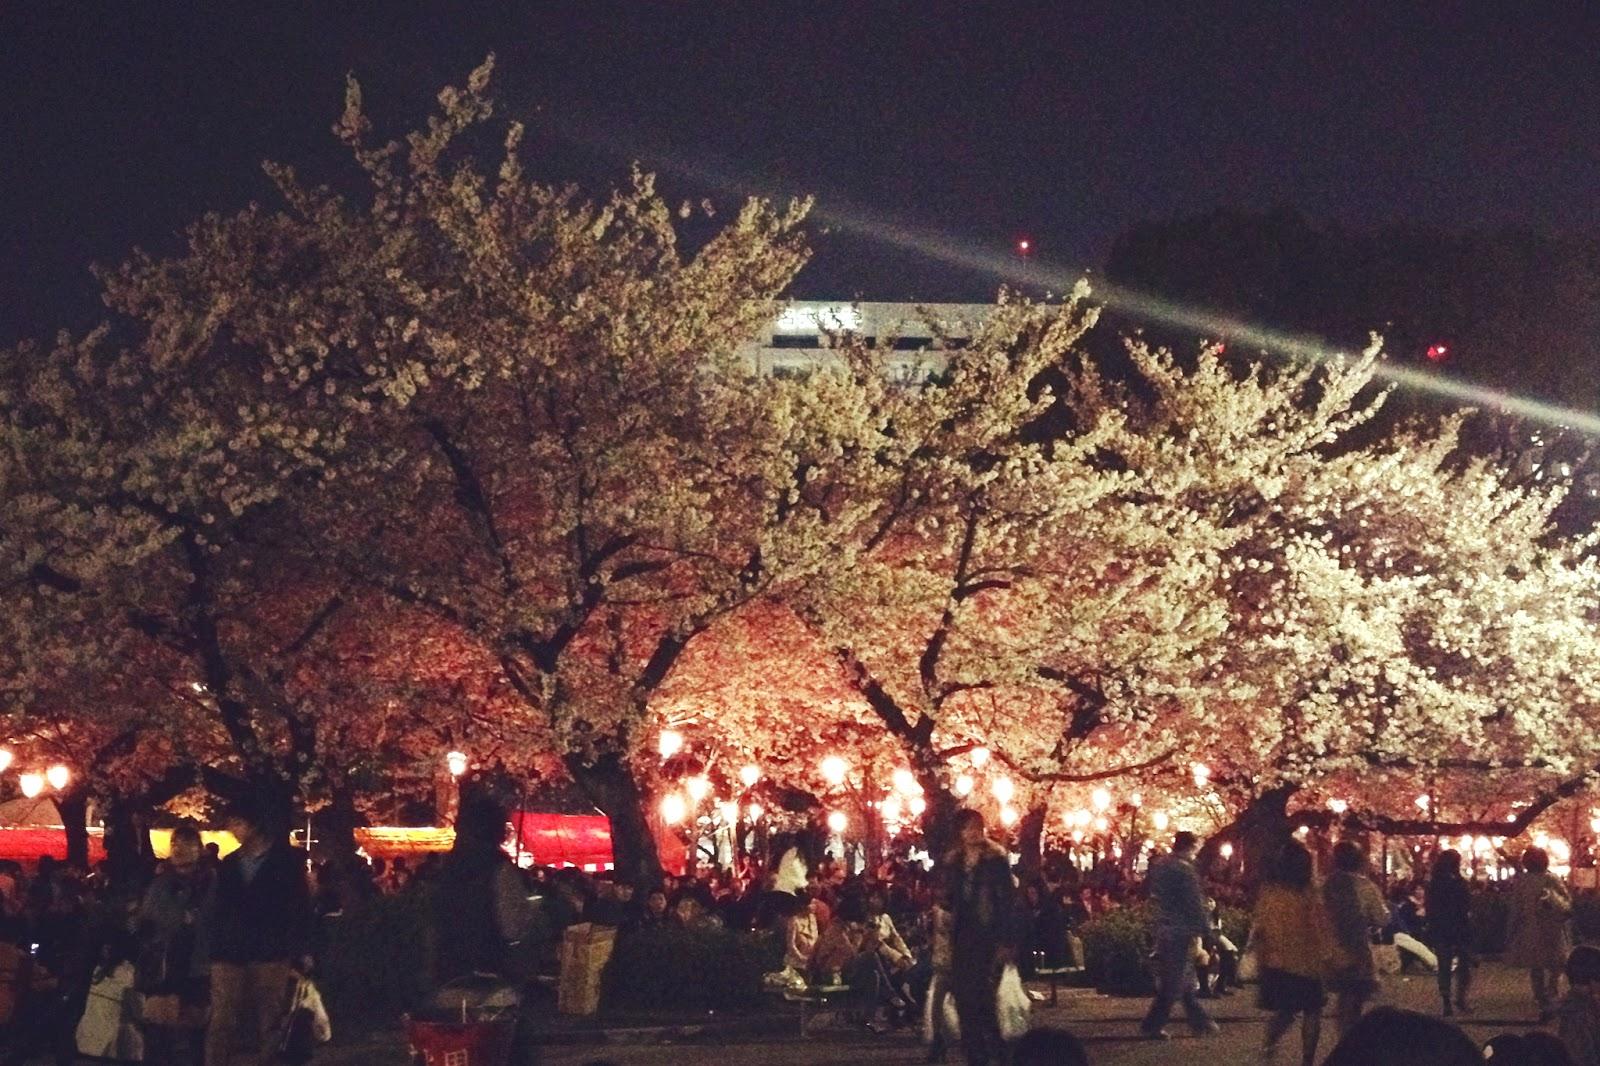 Jackson Riley Hanami A Party To Watch The Sakura